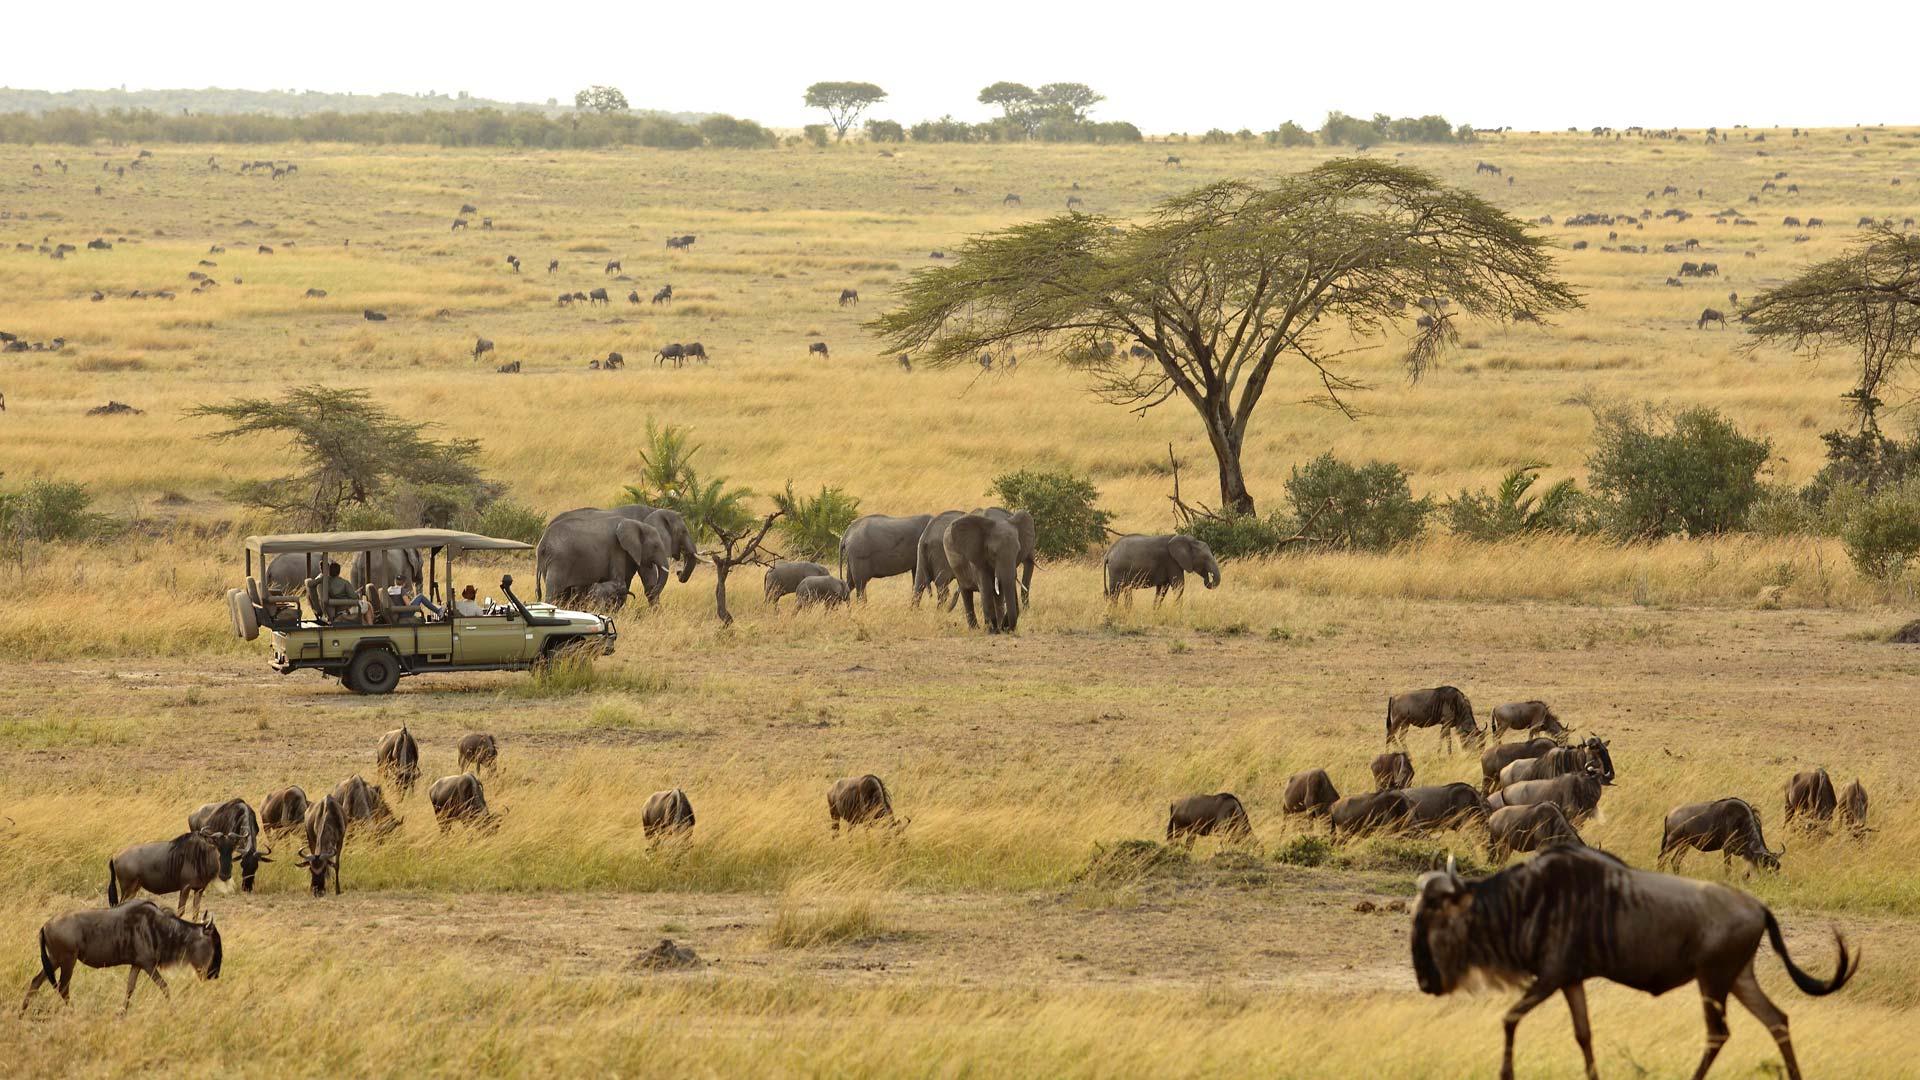 Elephant and Wildebeest Gamedrive